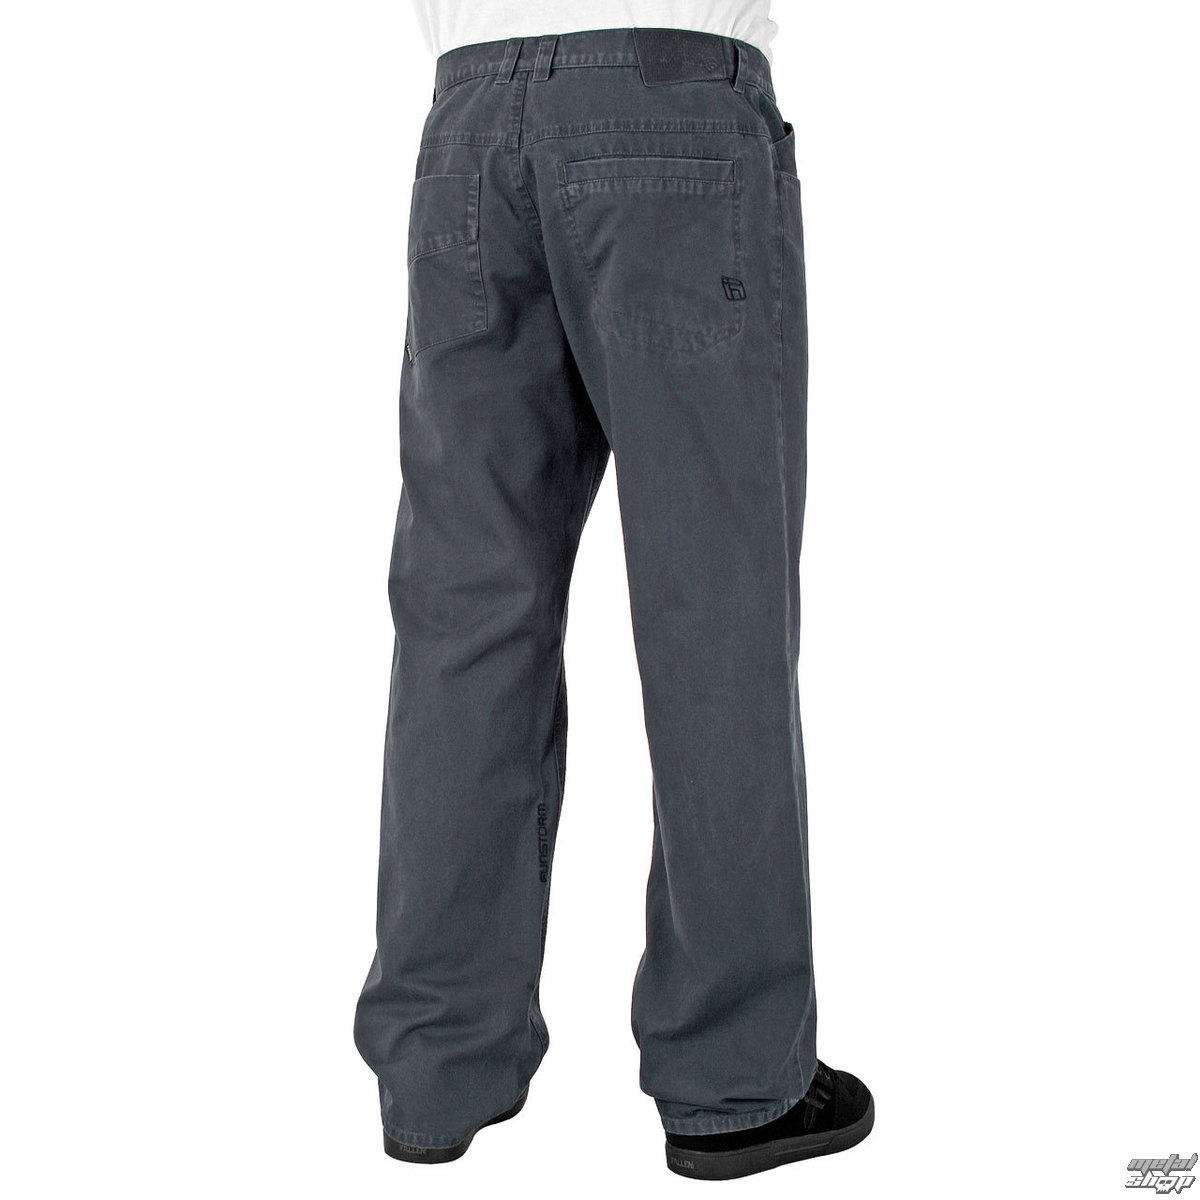 kalhoty pánské FUNSTORM - Pekin - 20 d Grey